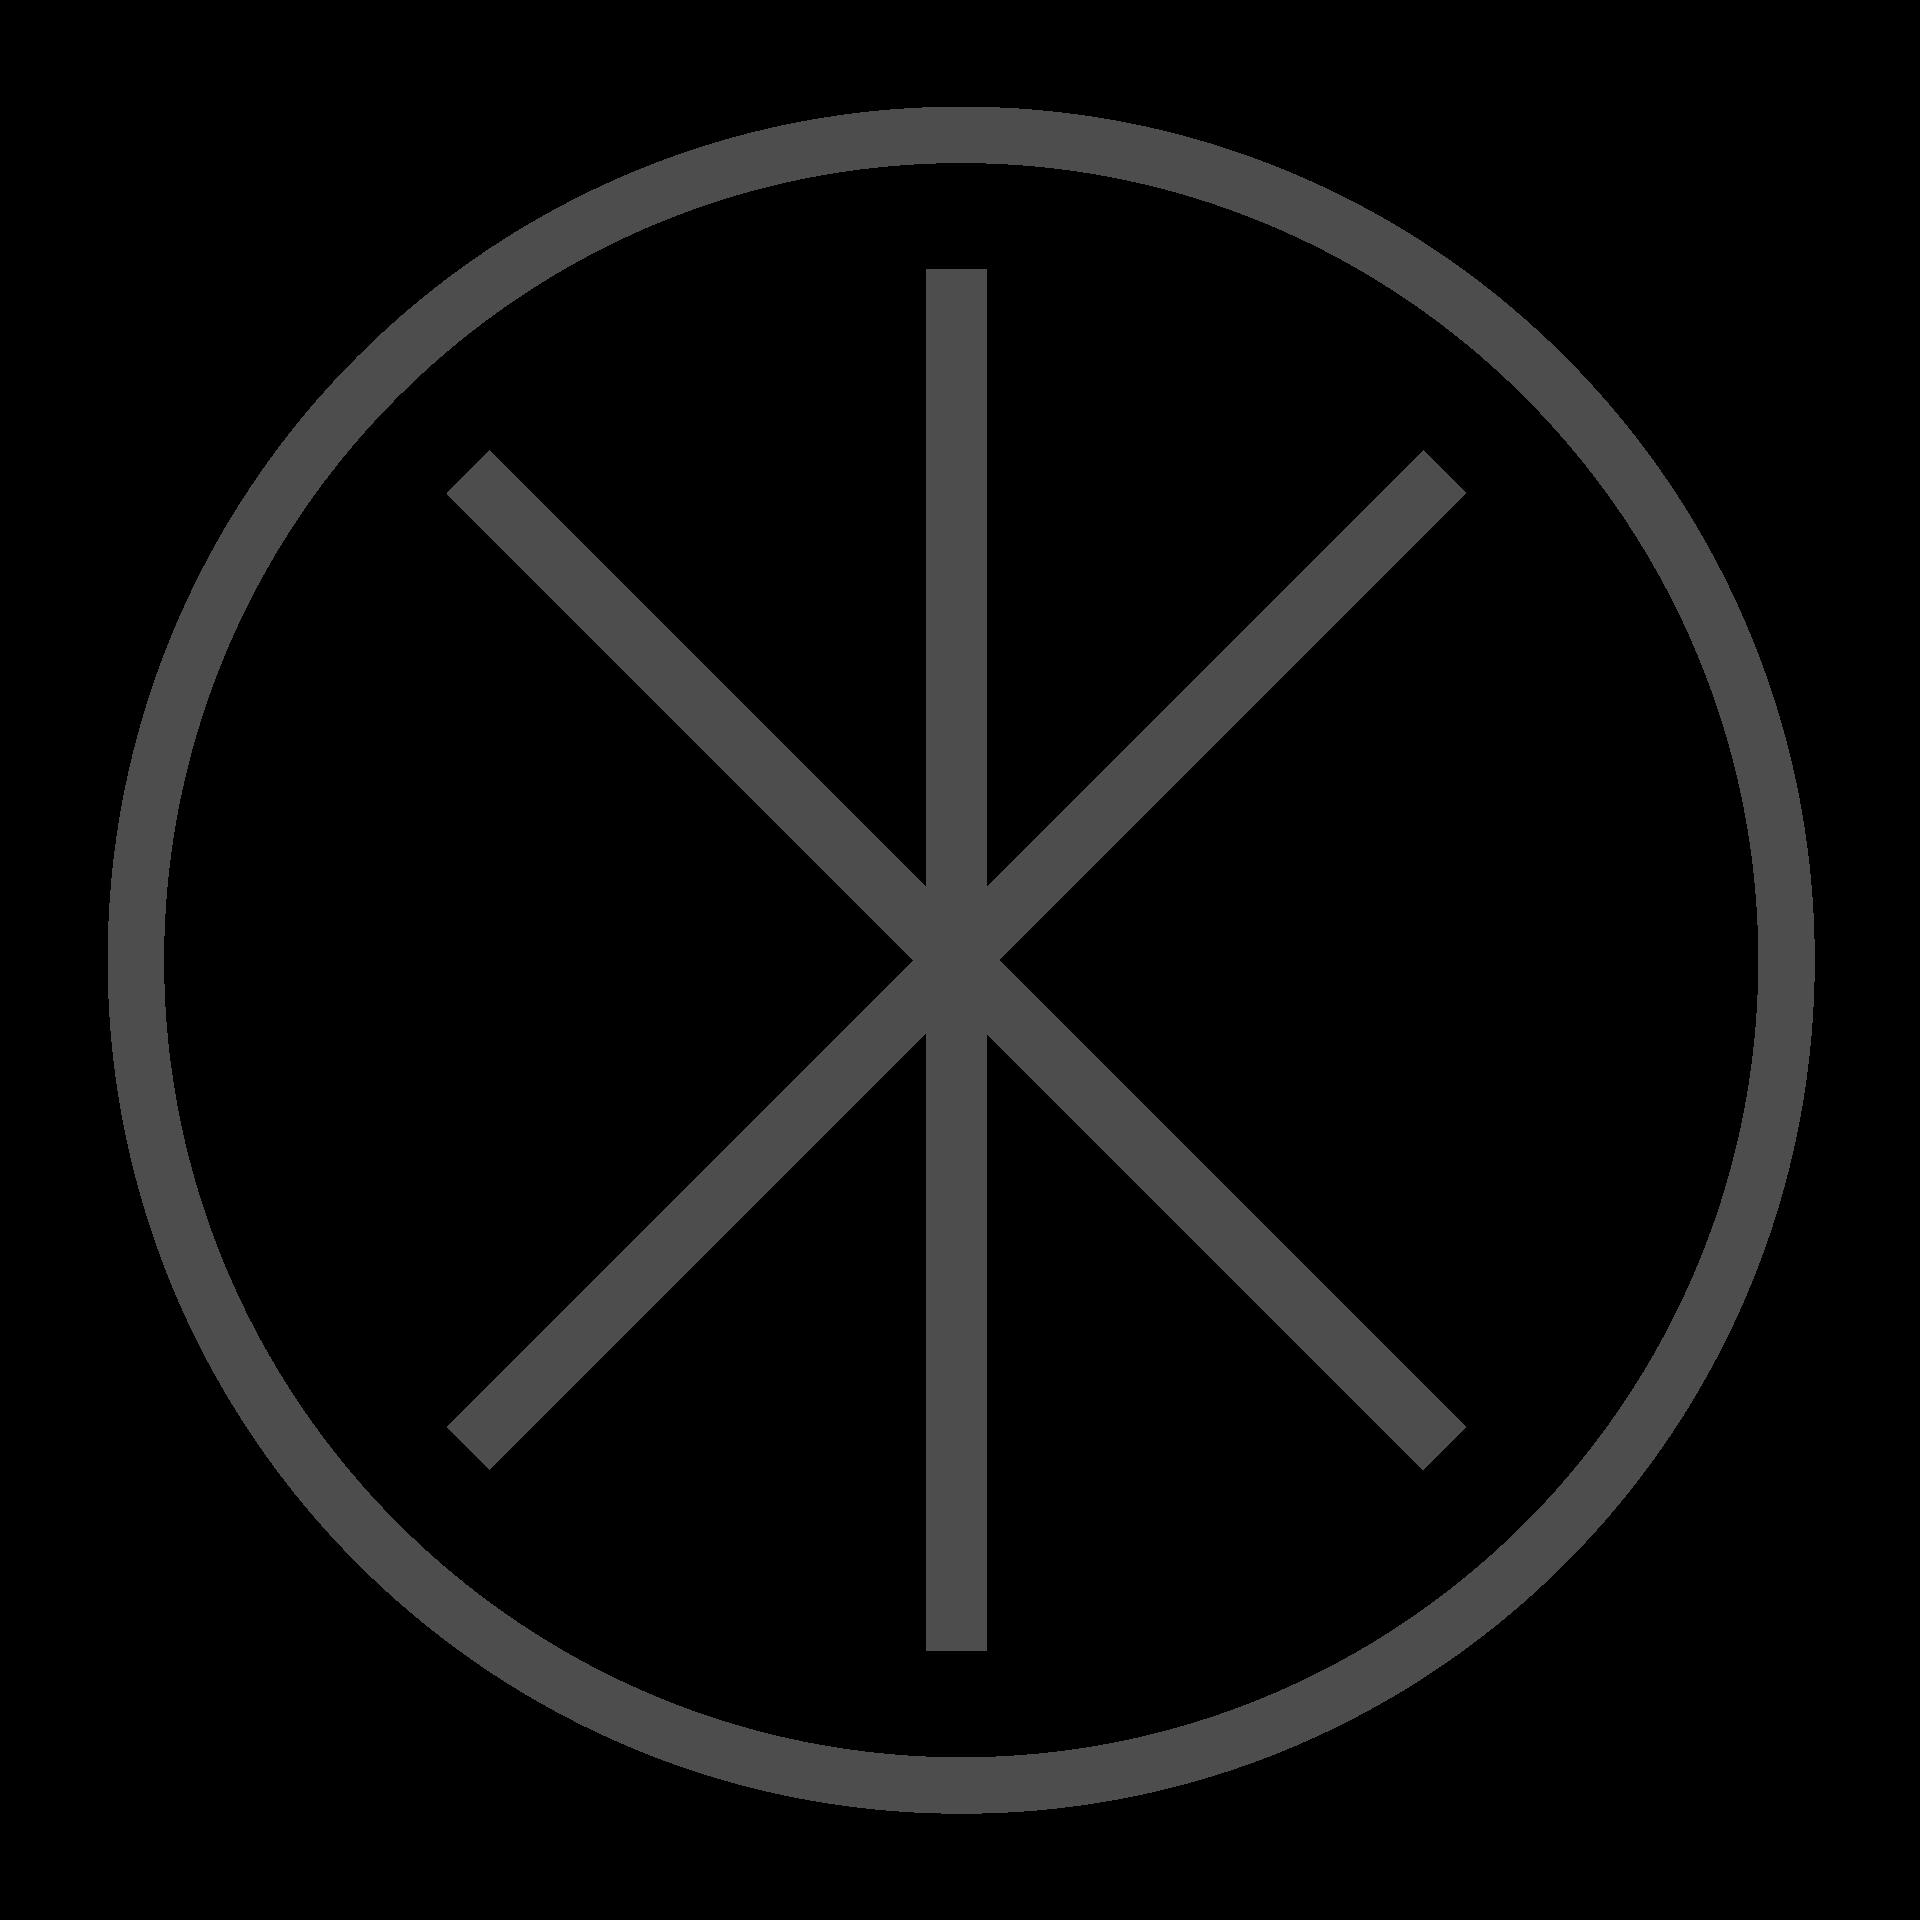 lunari-device-circle